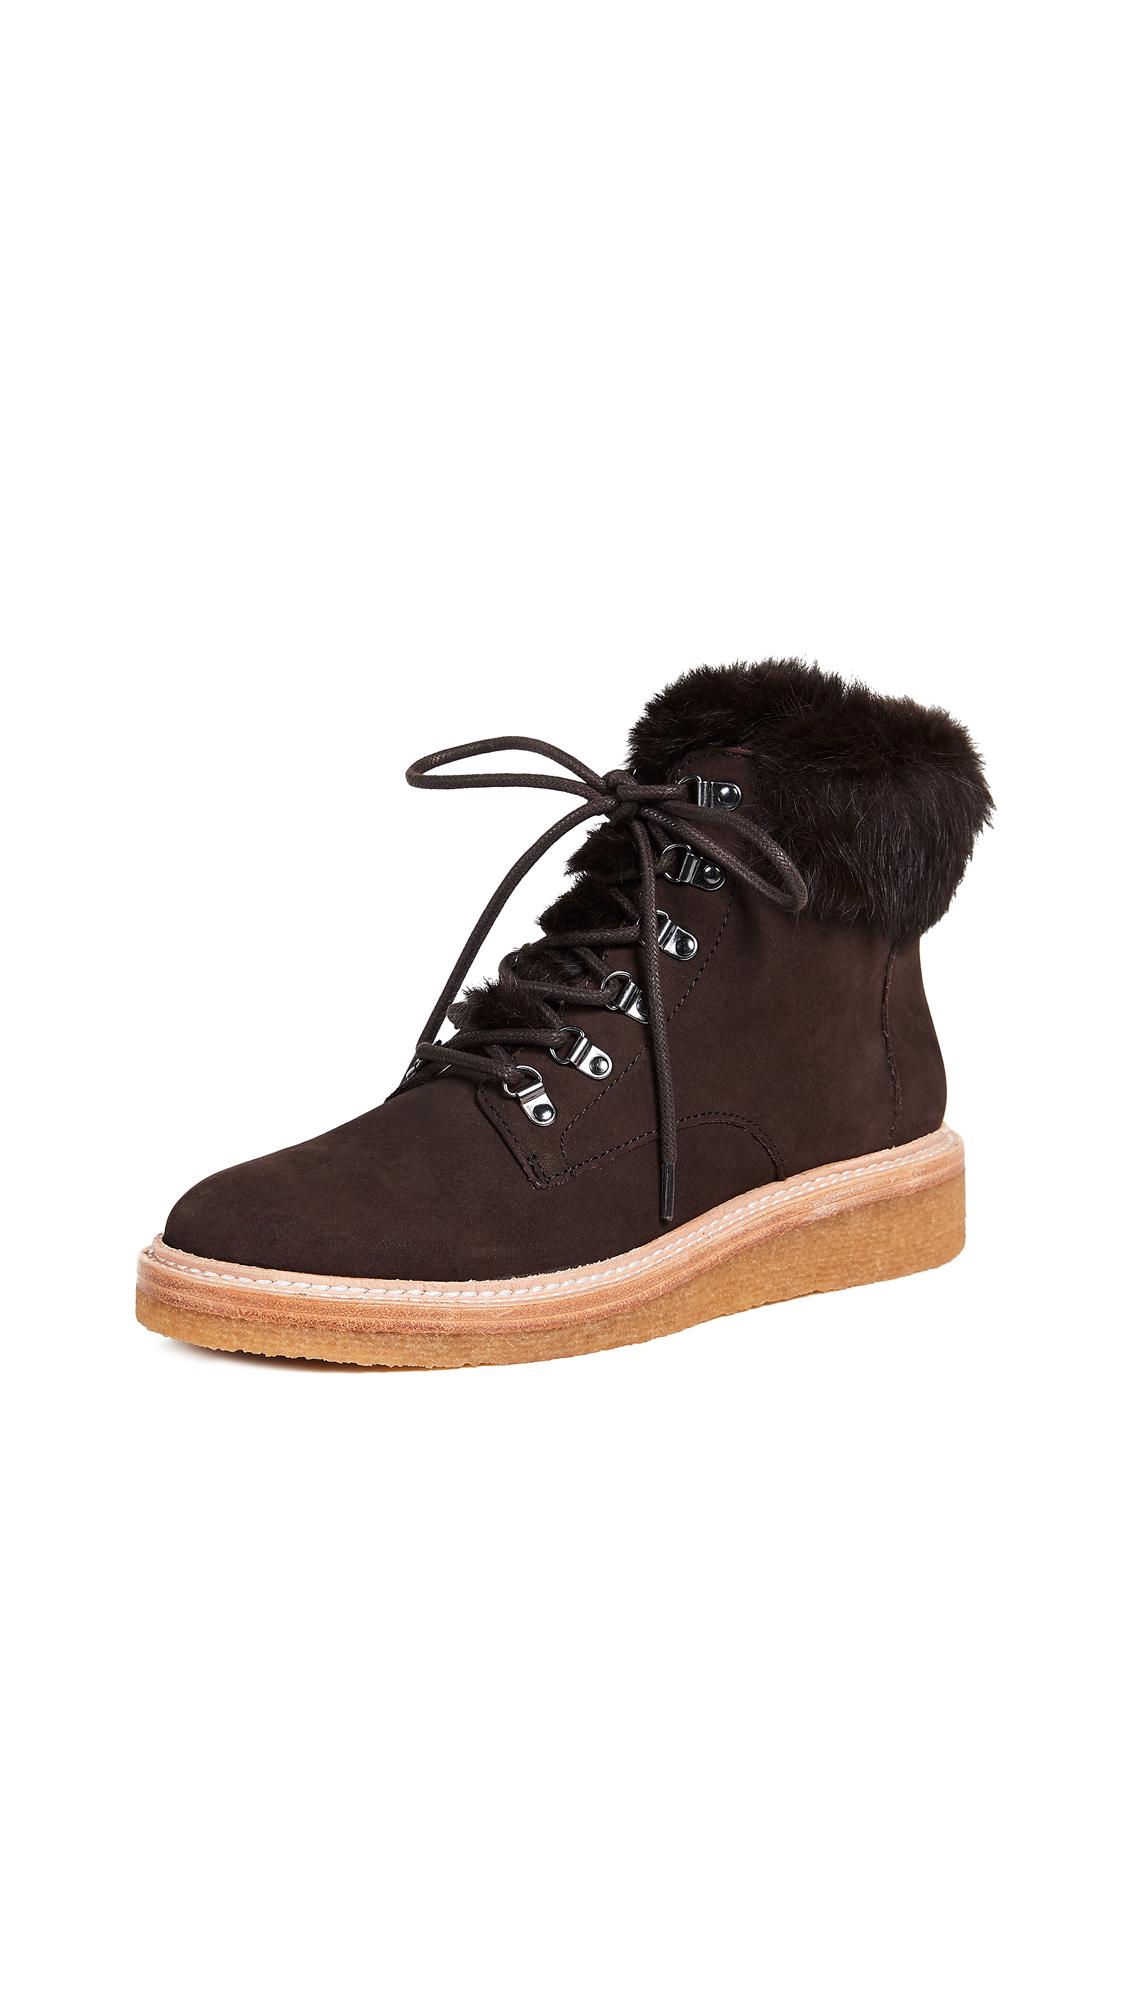 Botkier Winter Combat Boots - Mocha